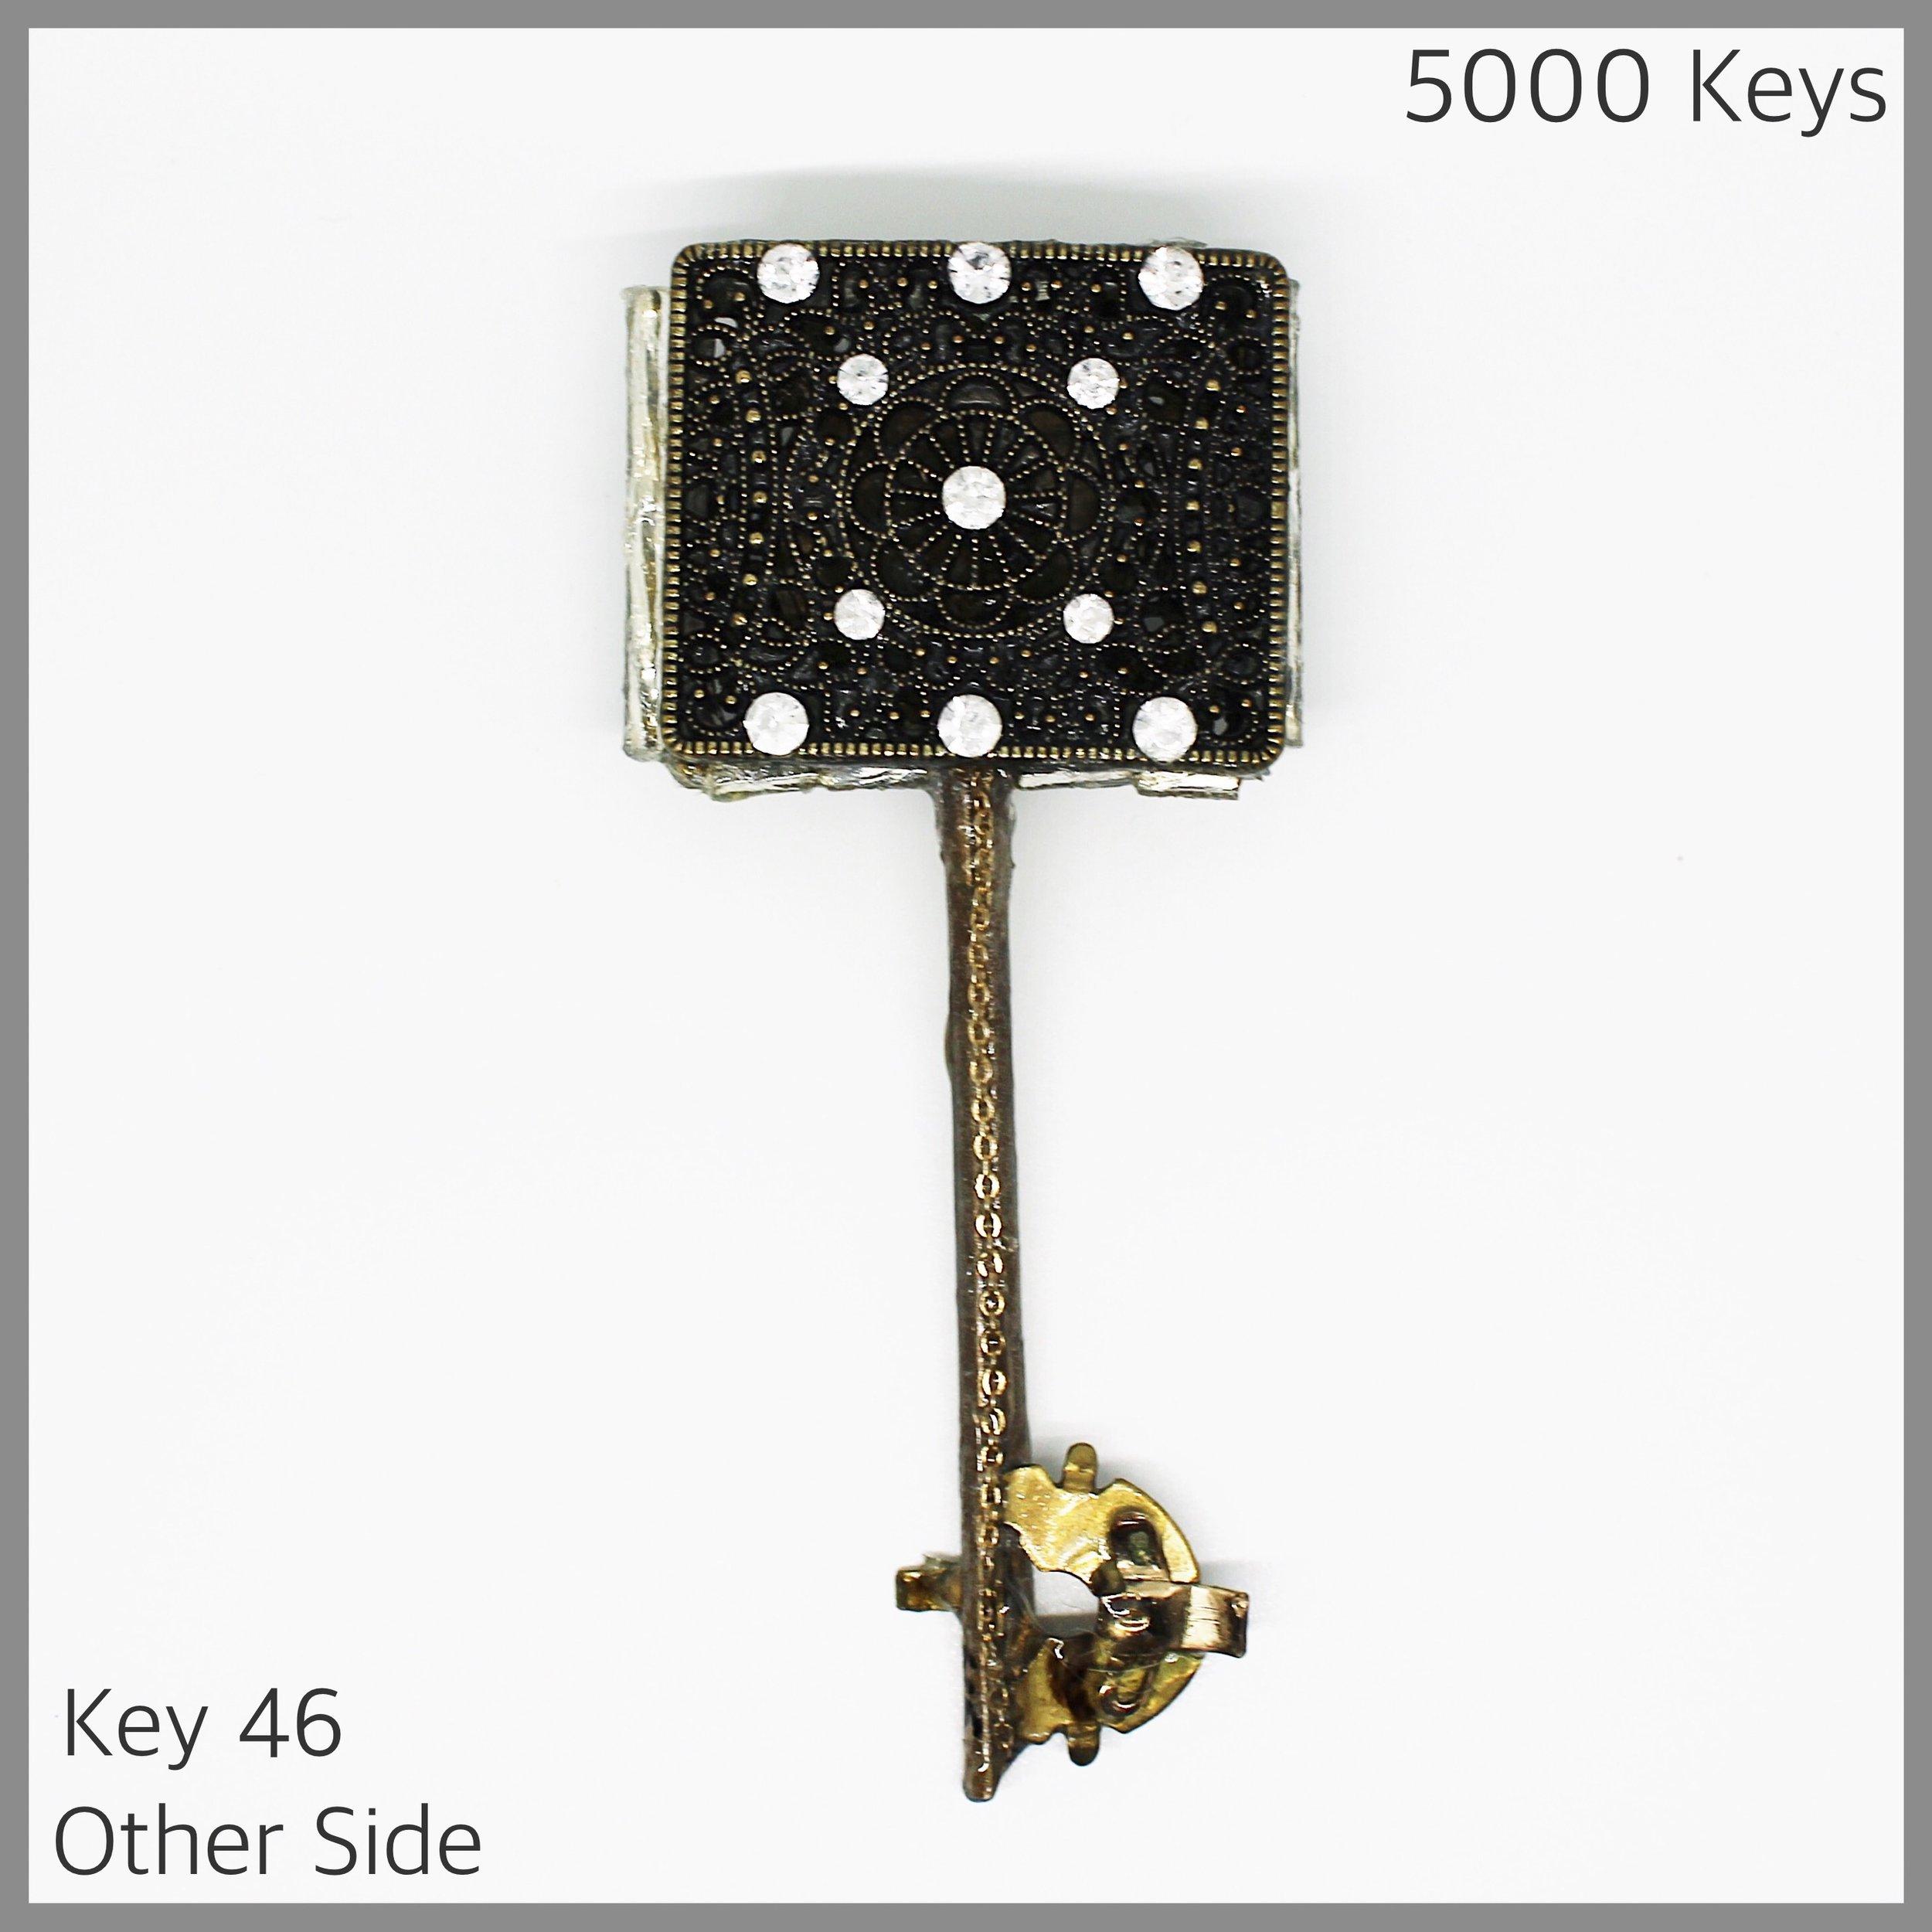 Key 46 other side - 1.JPG